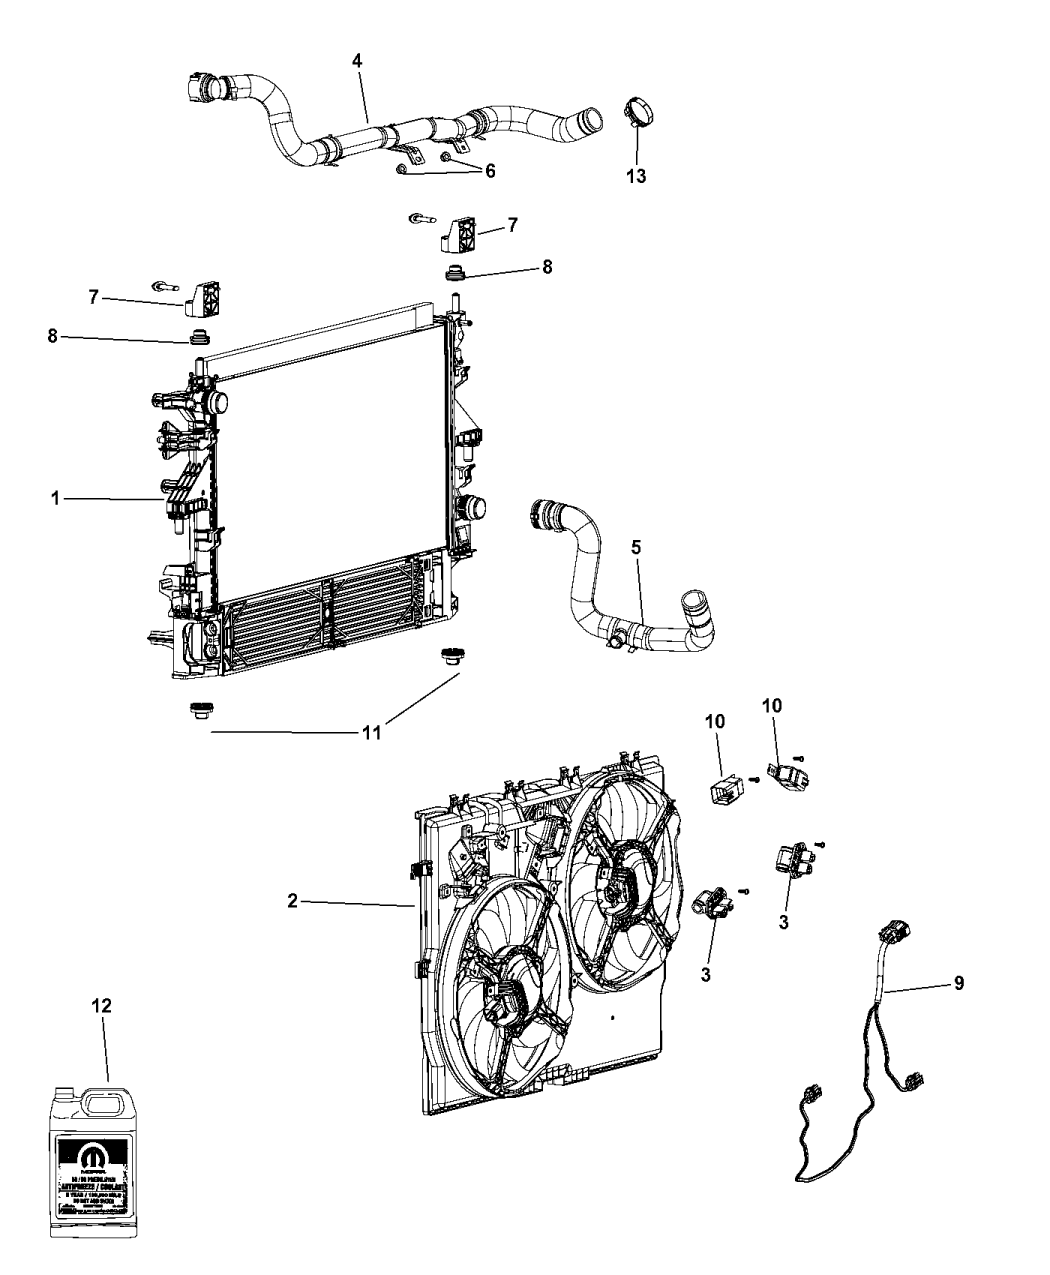 4727659ad Genuine Mopar Wiring Radiator Fan Engine Diagram 2015 Ram Promaster 3500 Related Parts